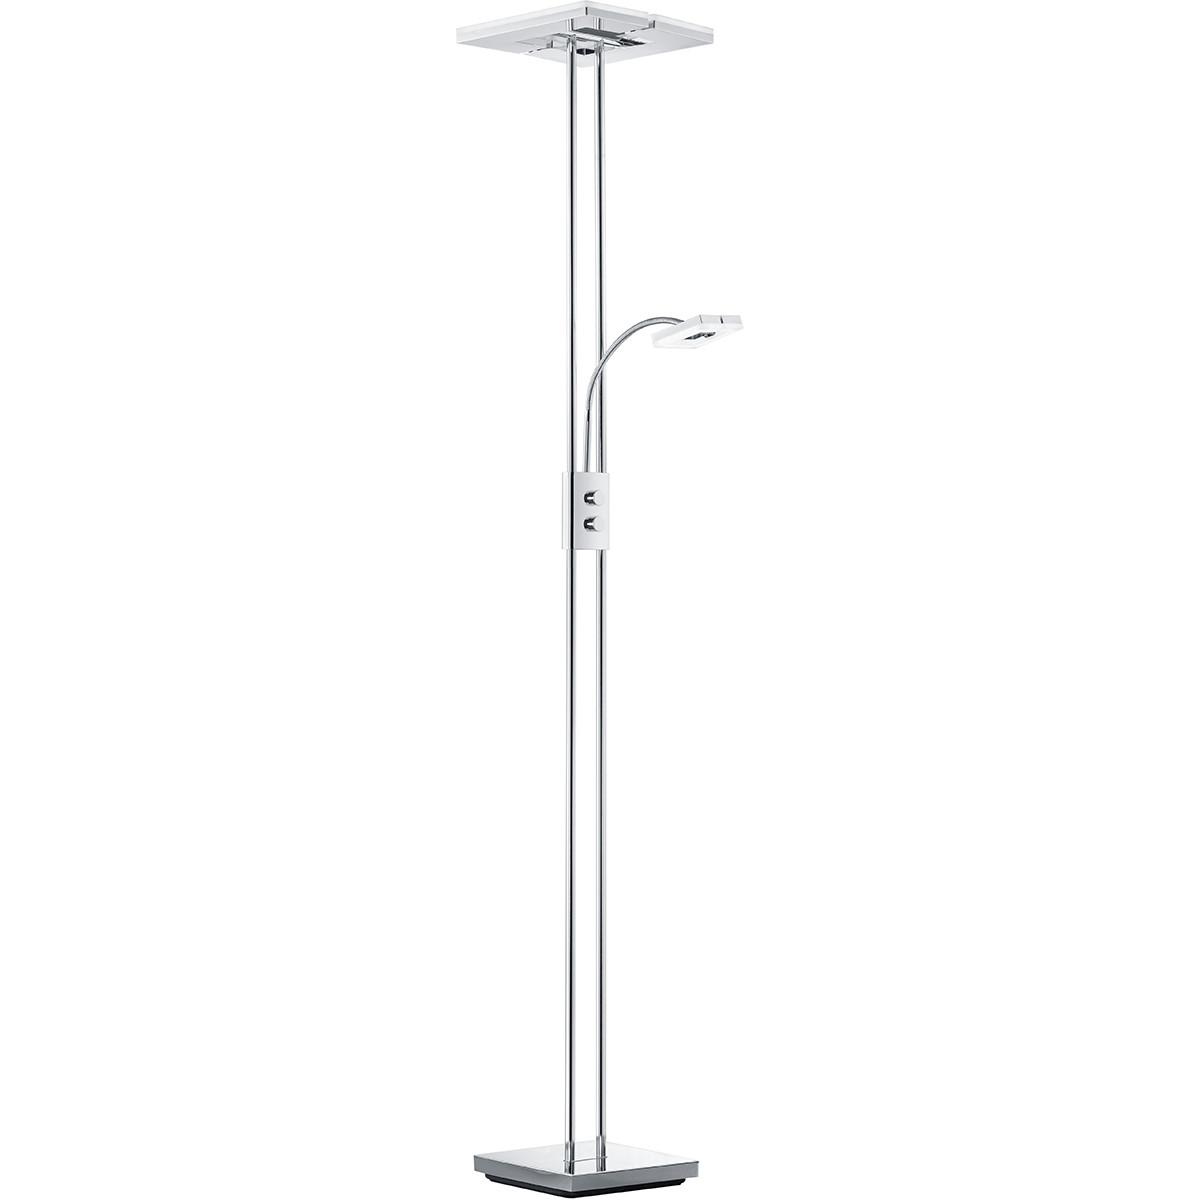 LED Vloerlamp - Trion Avinago - 20W + 4W - Warm Wit 3000K - 2-lichts - Dimbaar - Vierkant - Glans Ch